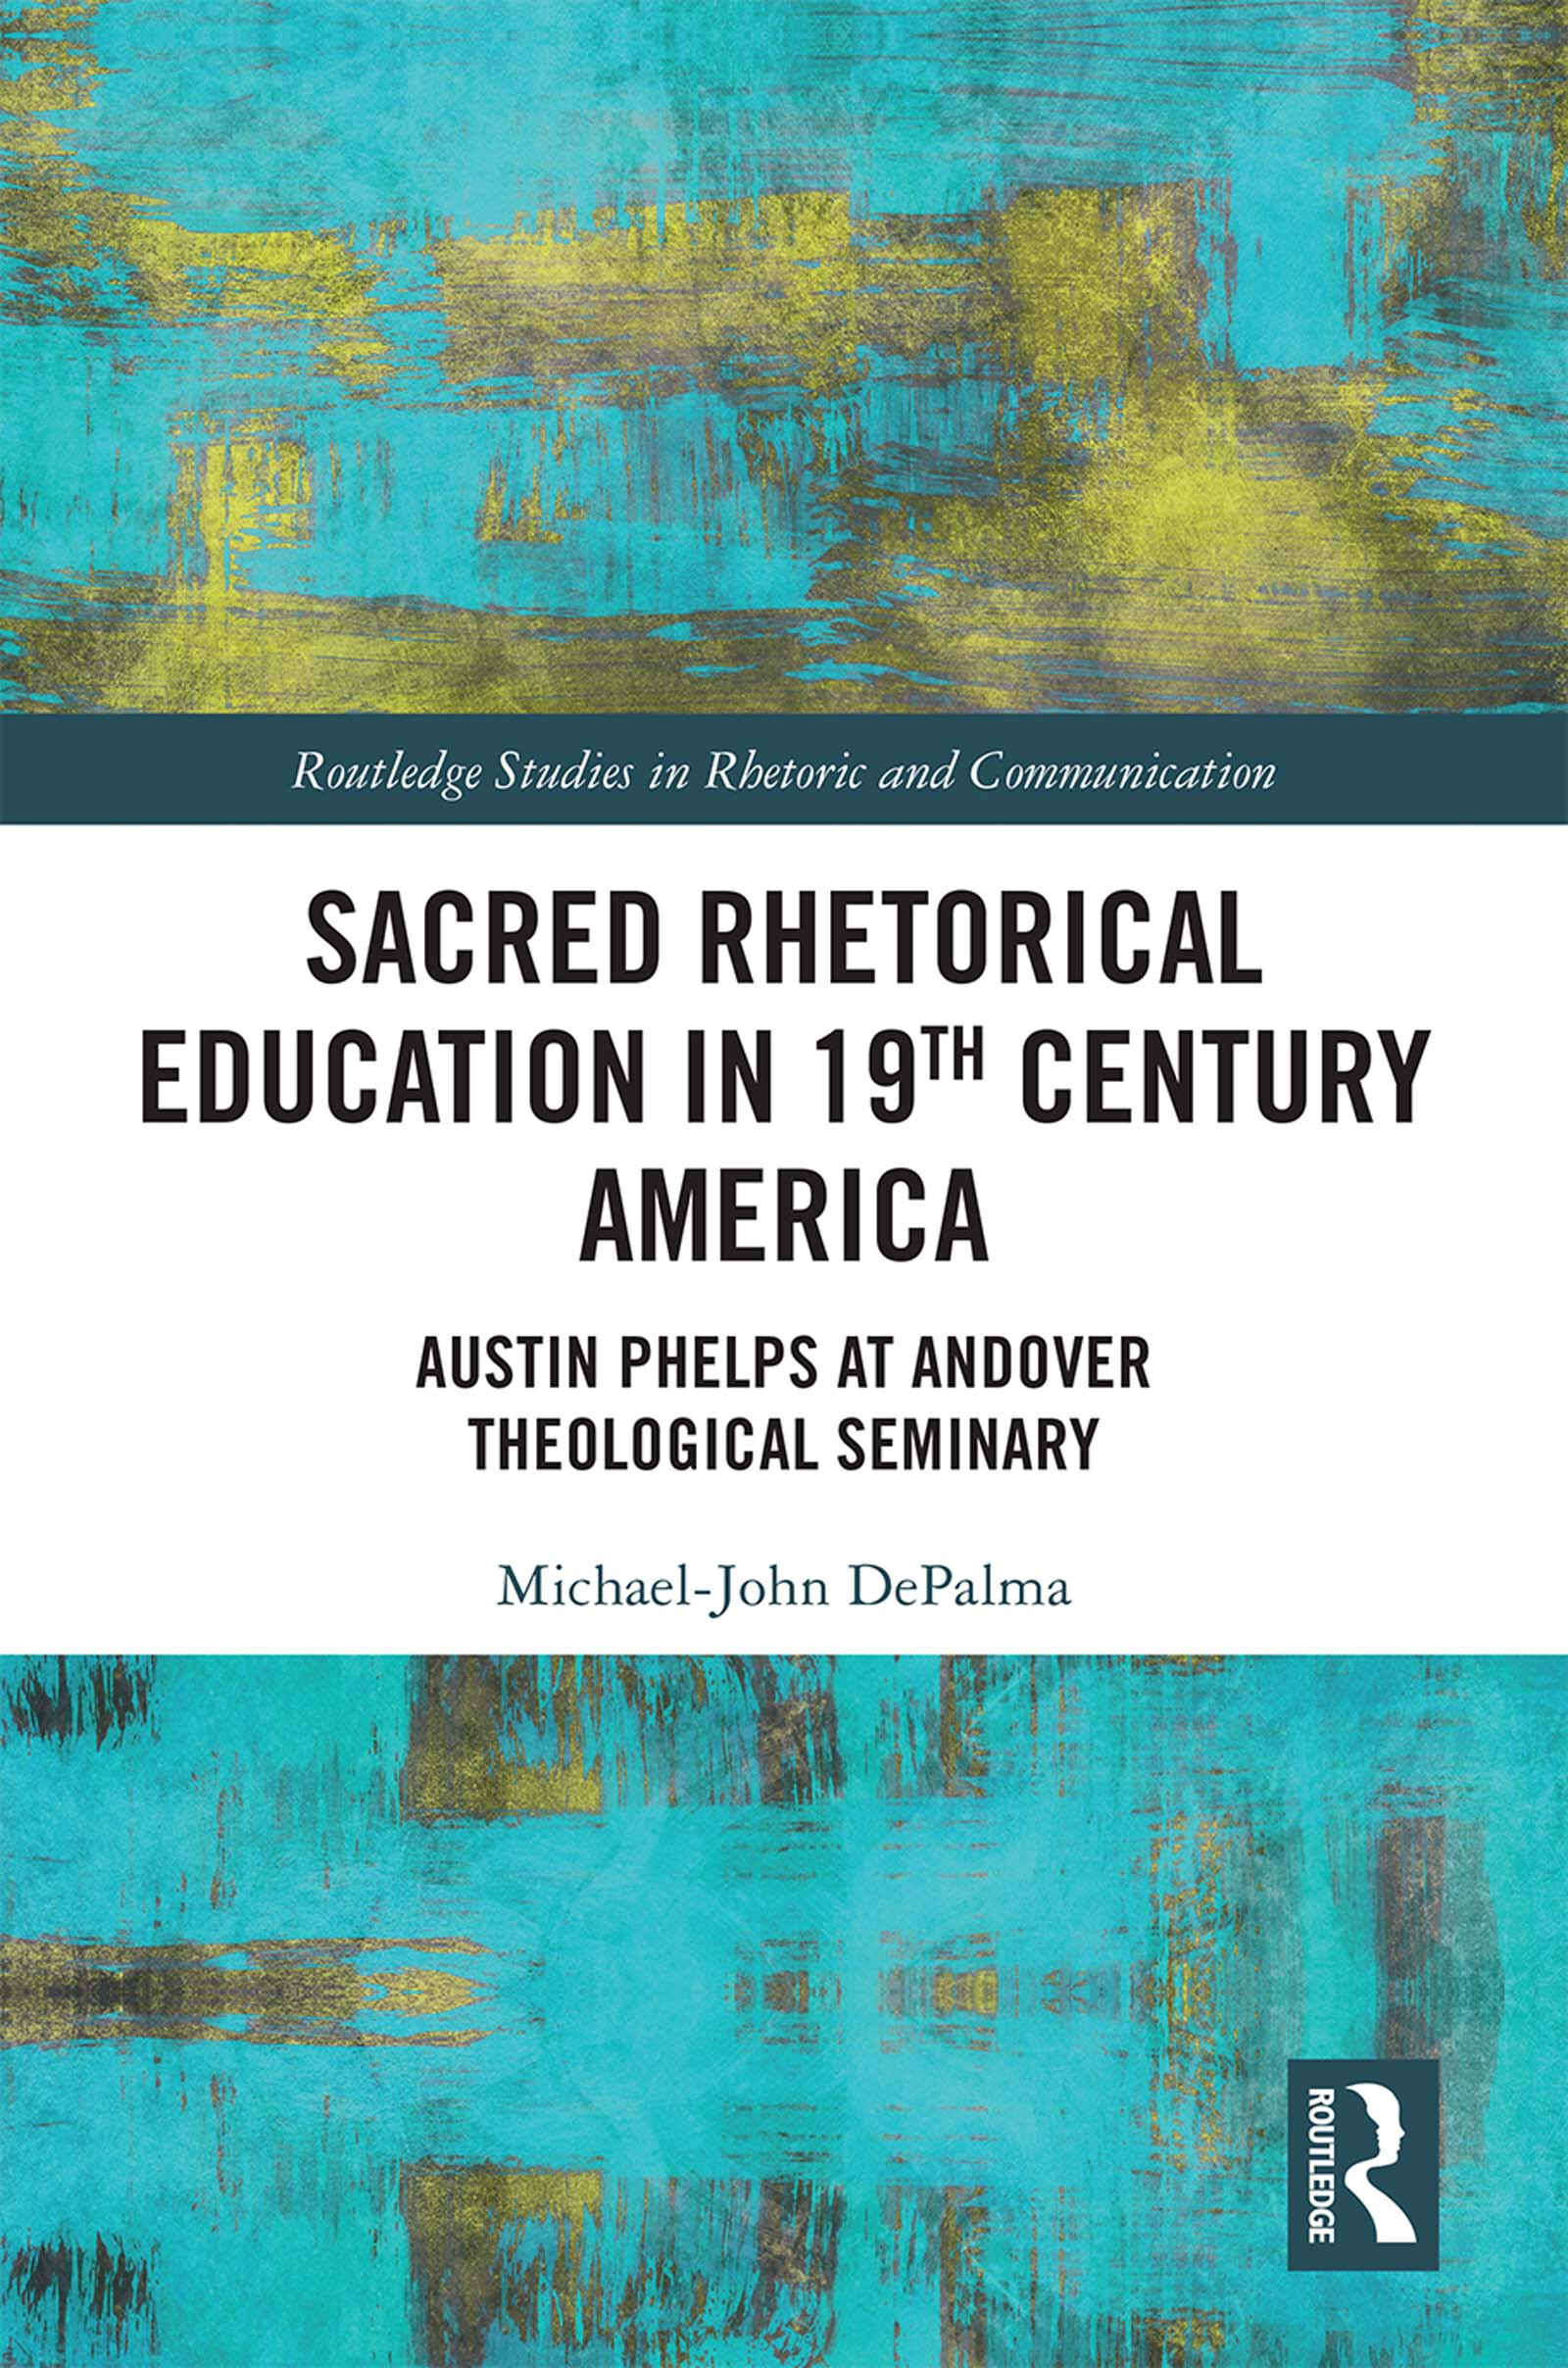 Sacred Rhetorical Education in 19th Century America